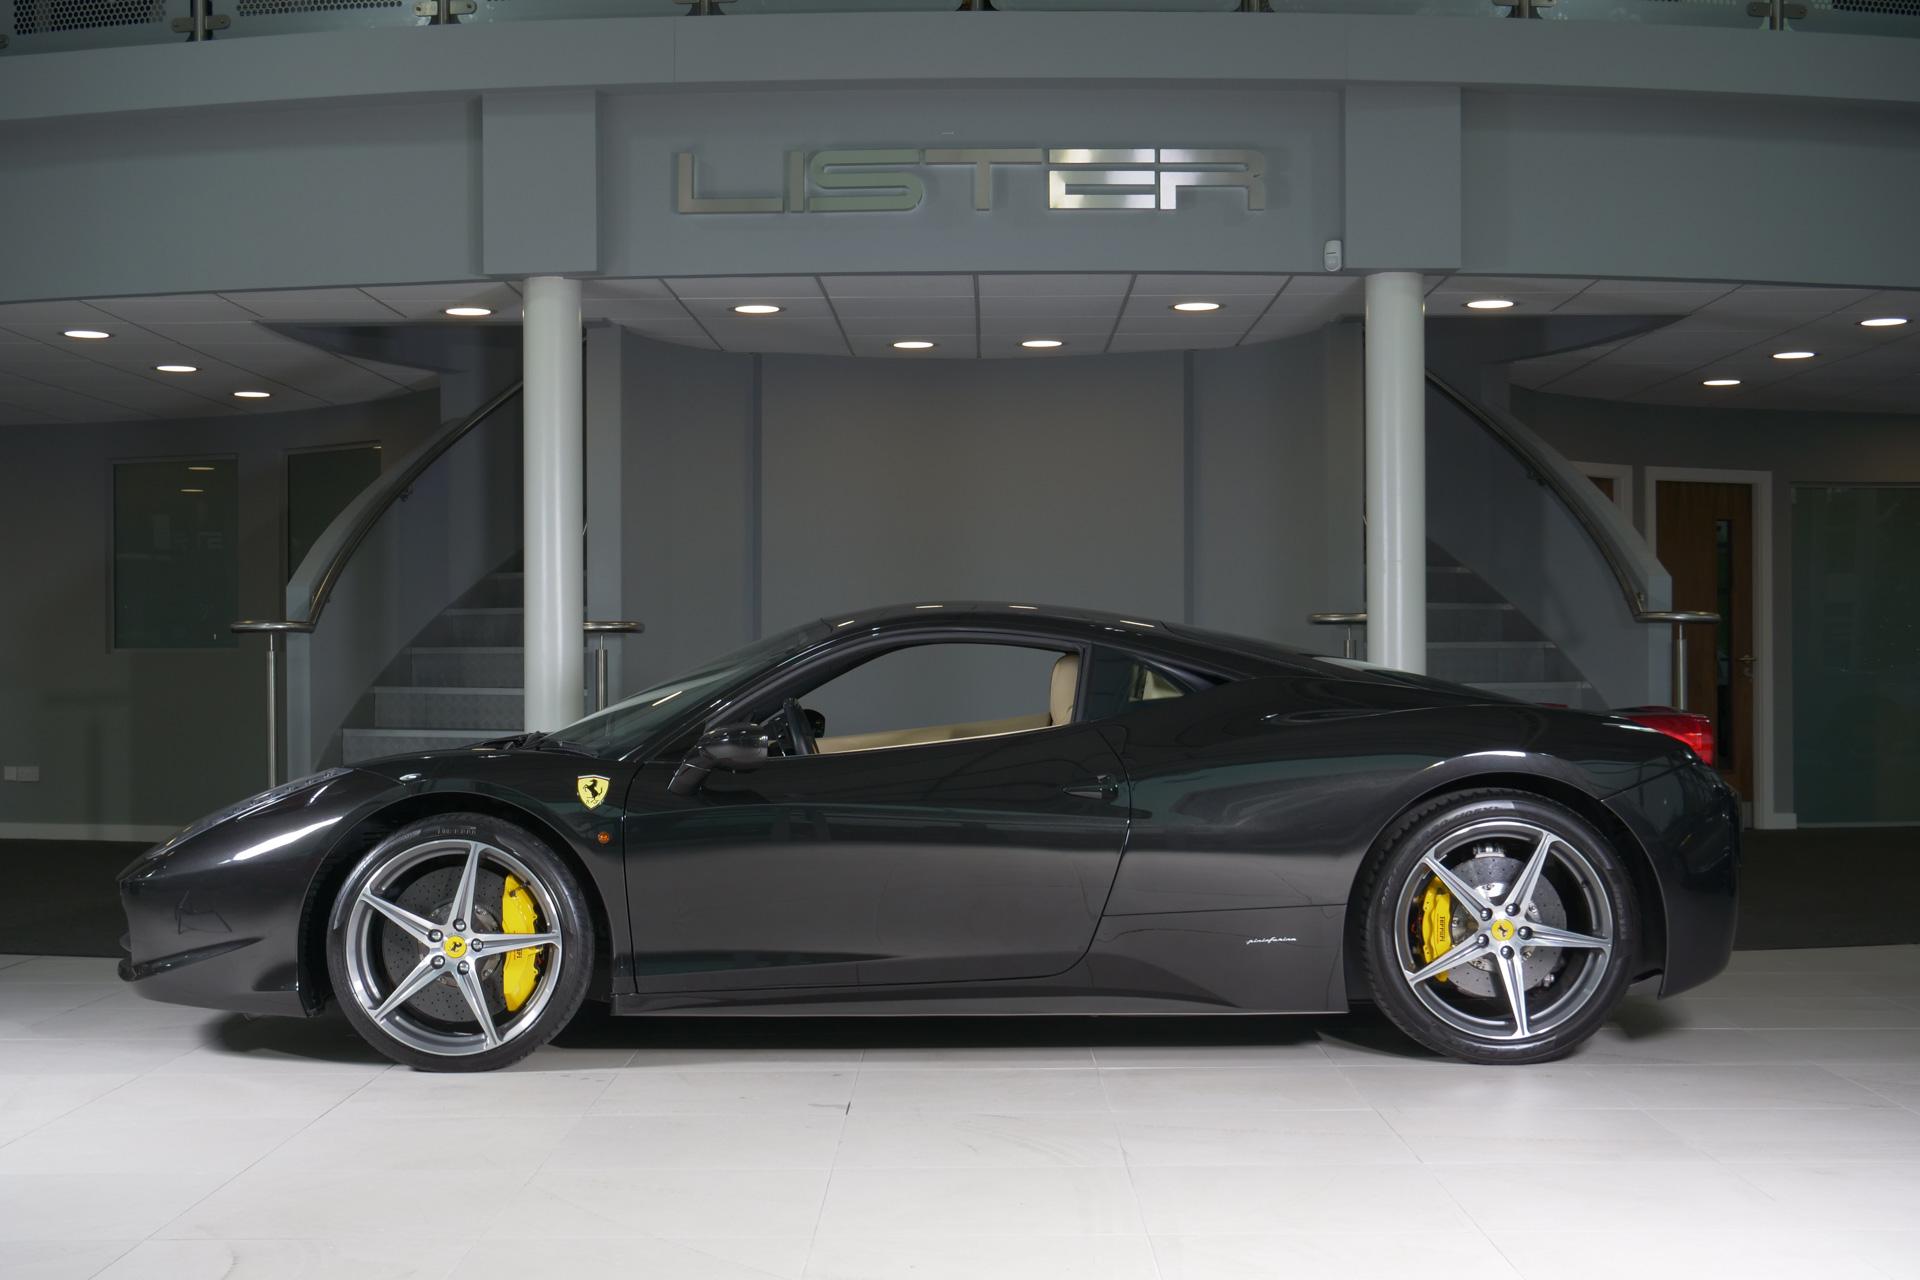 Listing #2013-Ferrari-458-Italia-RFpkLMCA | Lister Classics